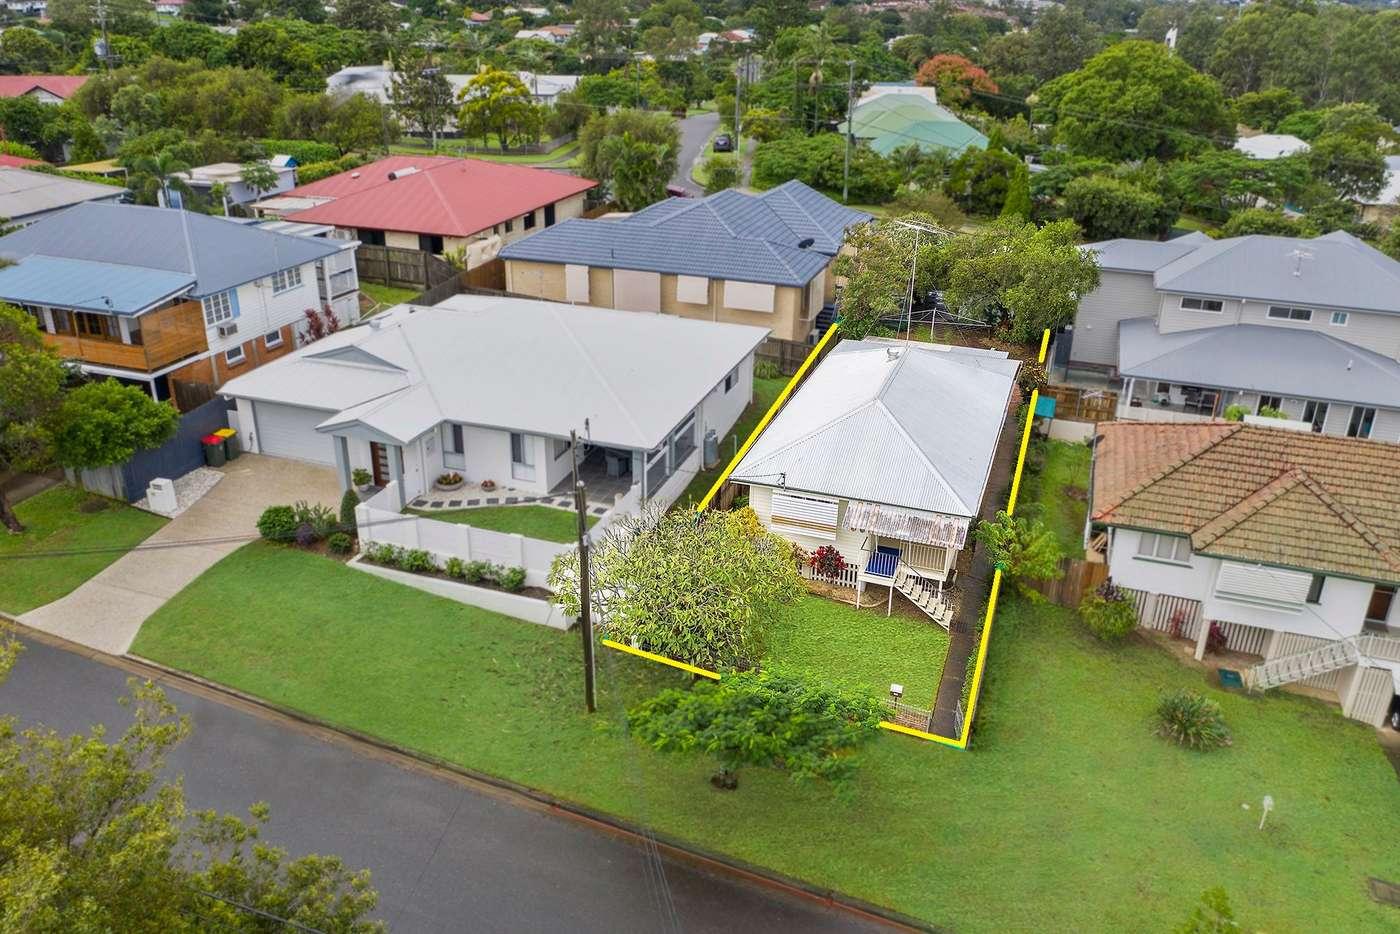 Main view of Homely house listing, 15 Gatton Street, Mount Gravatt East QLD 4122